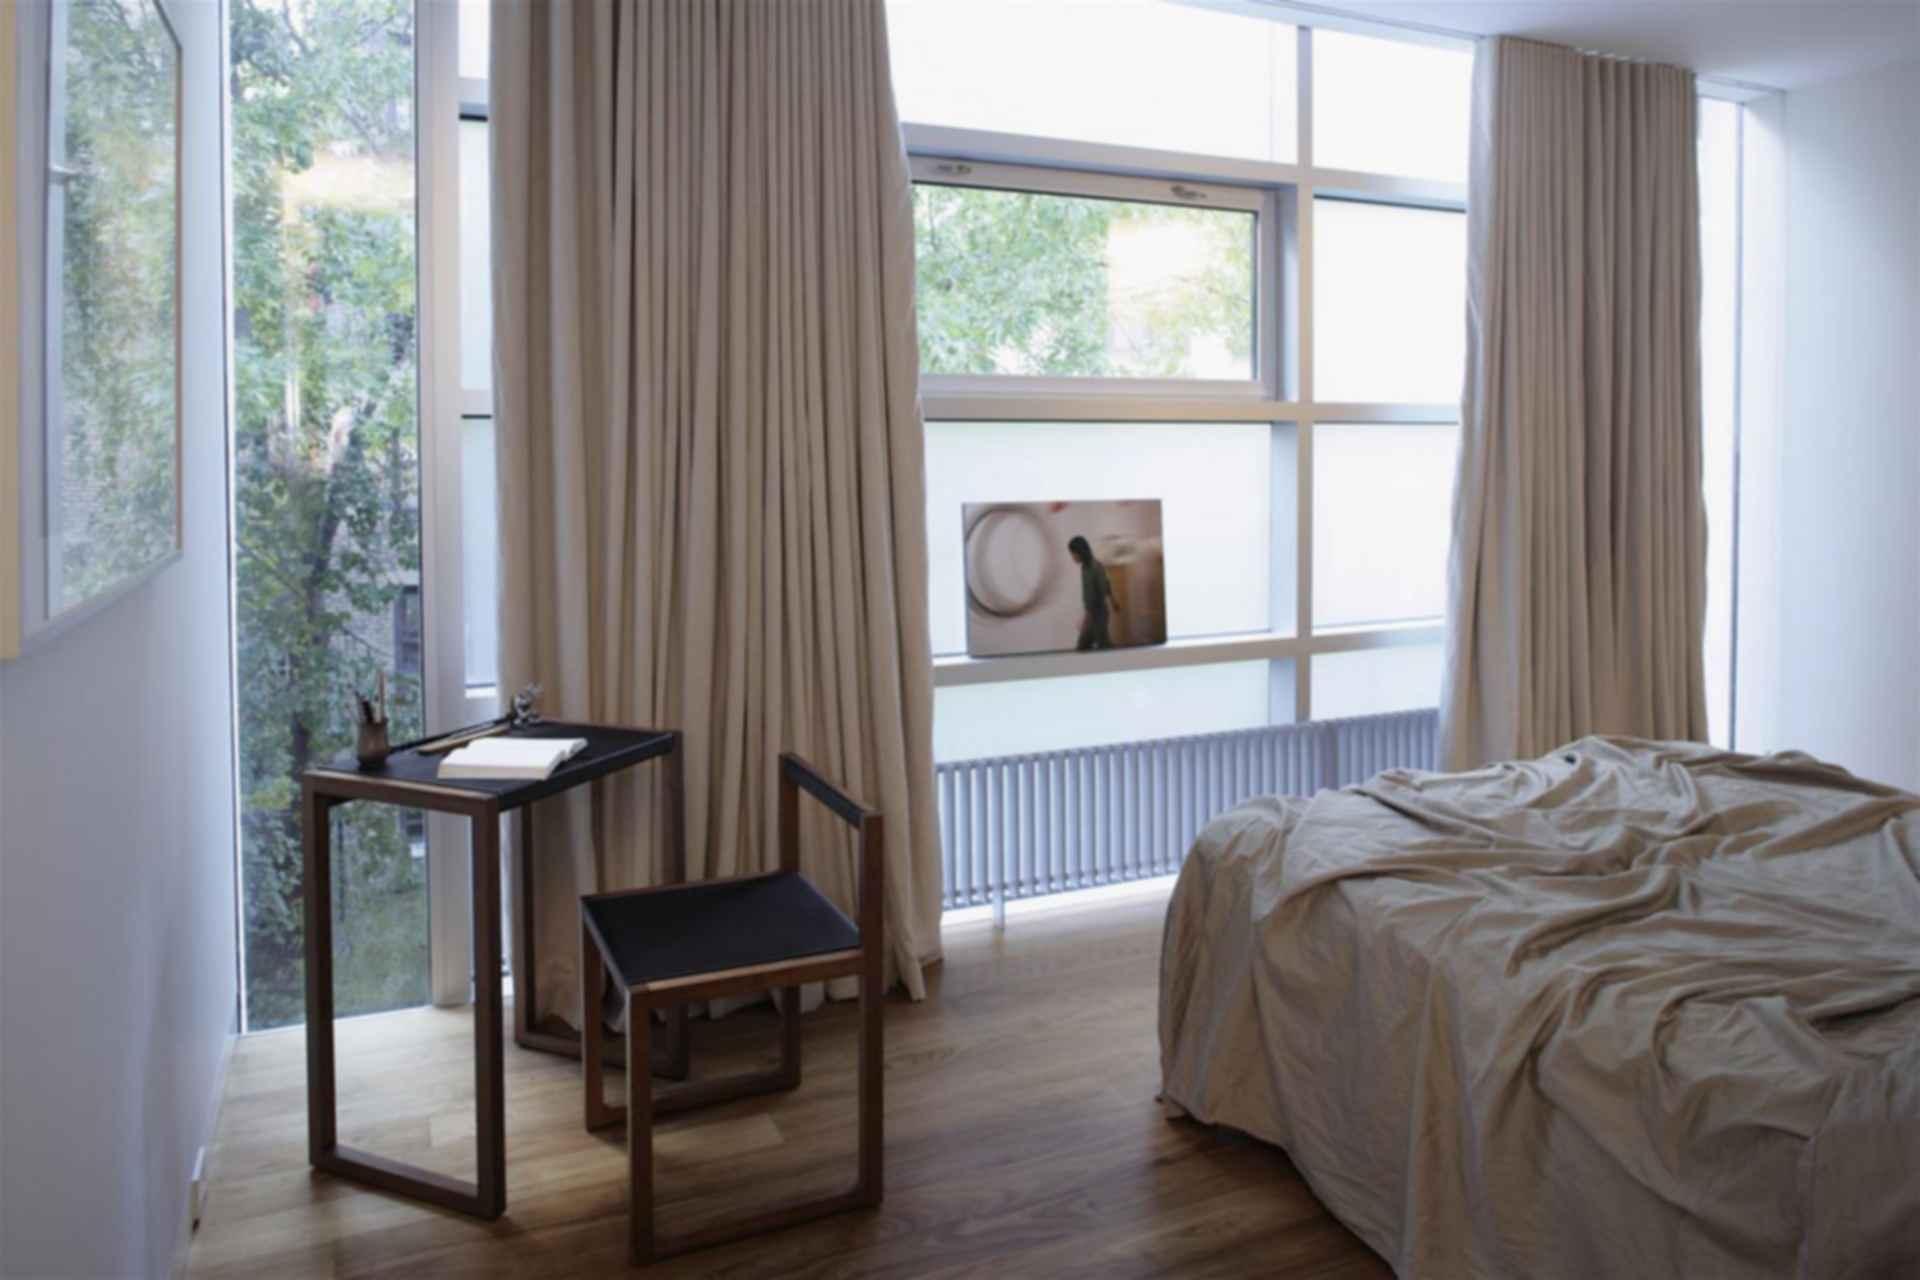 Urban Townhouse - interior/bedroom